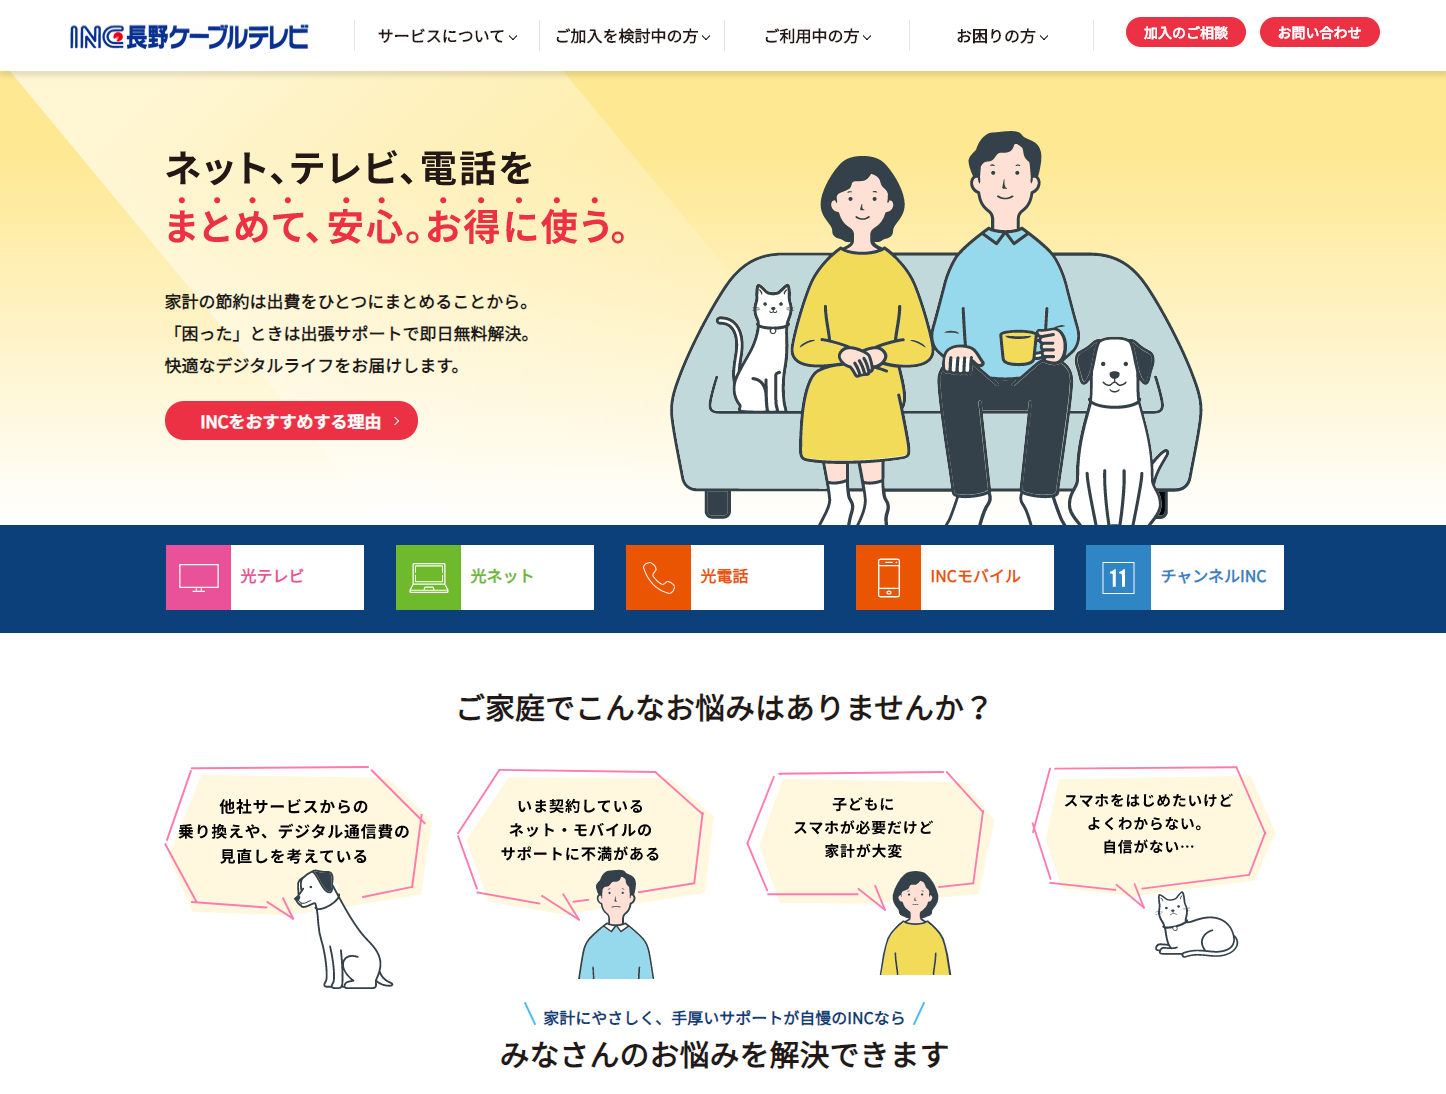 INC長野ケーブルテレビ 様